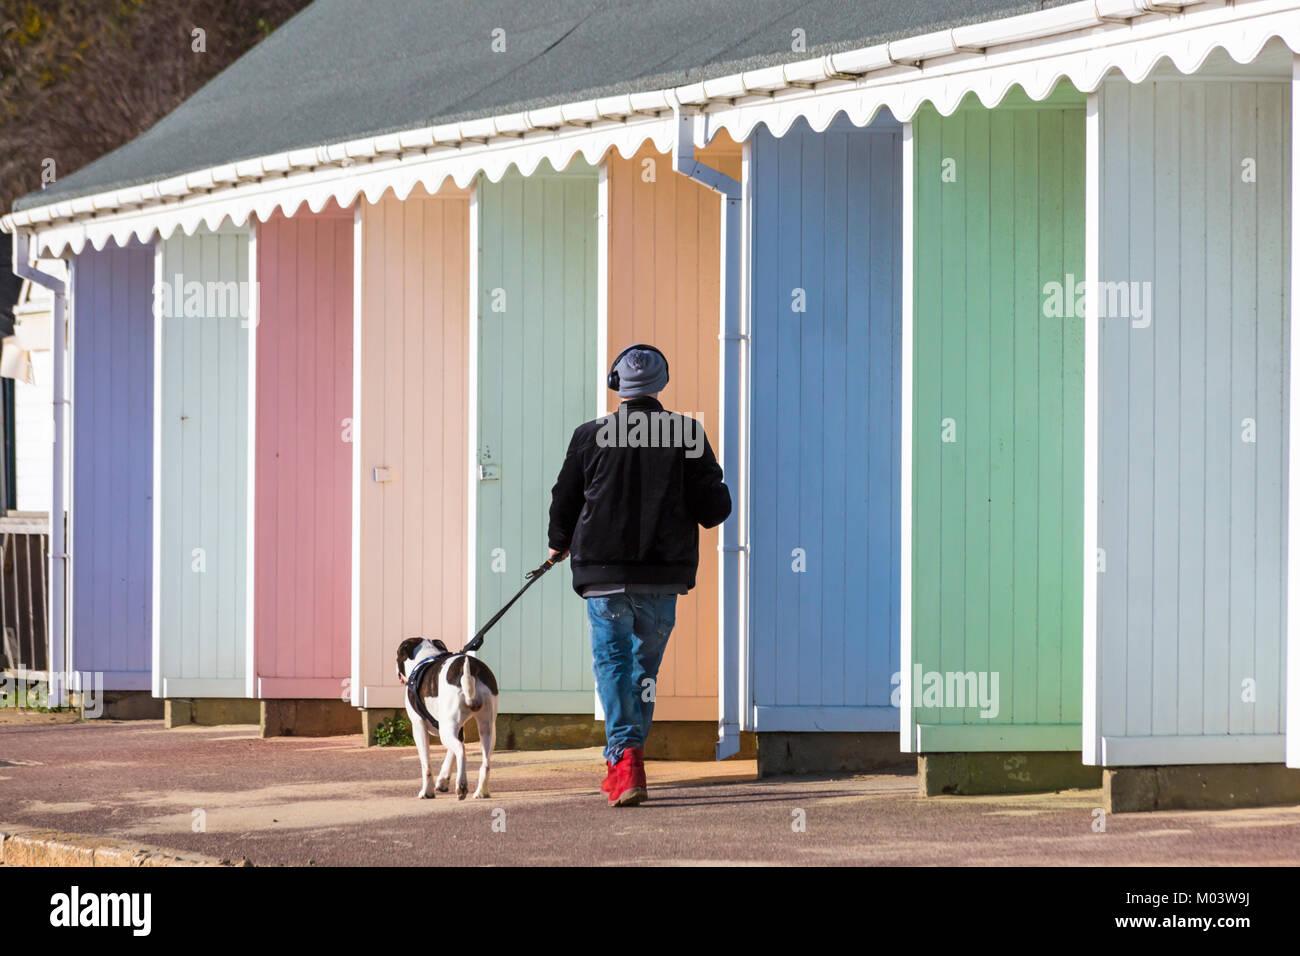 Bournemouth, Dorset, UK. 18th Jan, 2018. UK weather: a lovely sunny day at Bournemouth beach. Walking the dog along Stock Photo